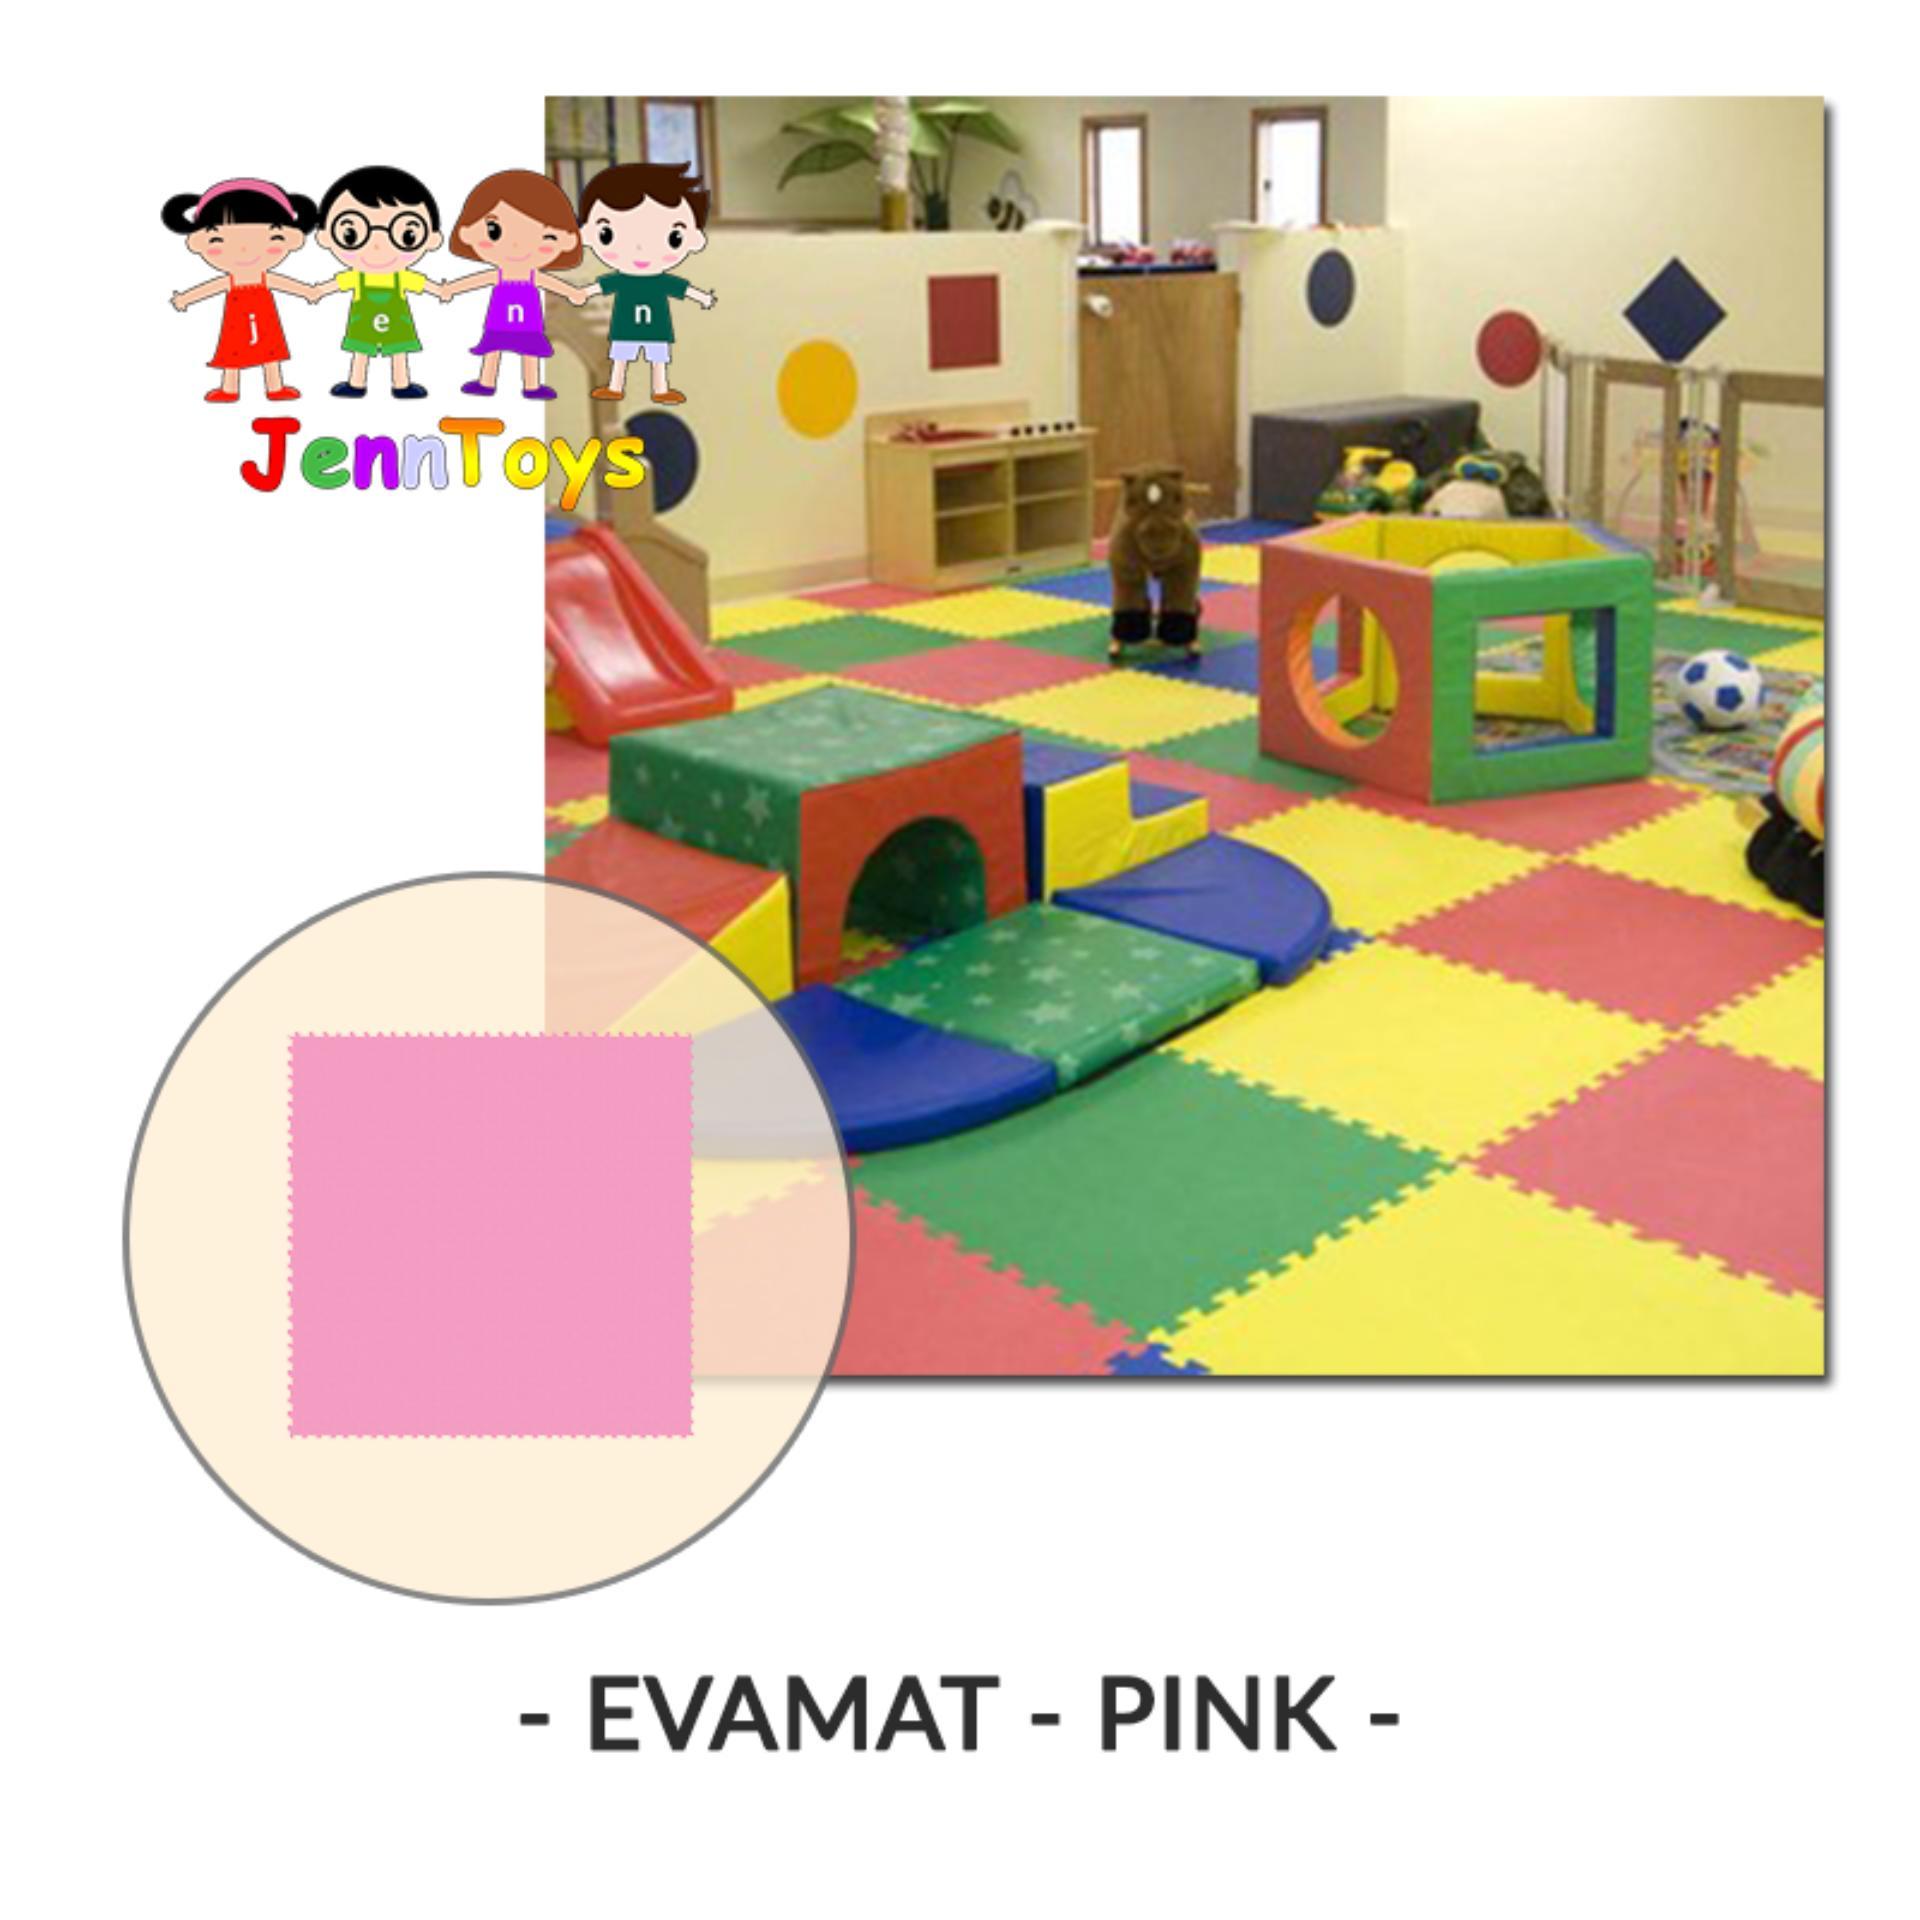 ... Evamat - Polos / Matras / Tikar / Karpet / Puzzle Alas LantaiEvamat - Pink ...